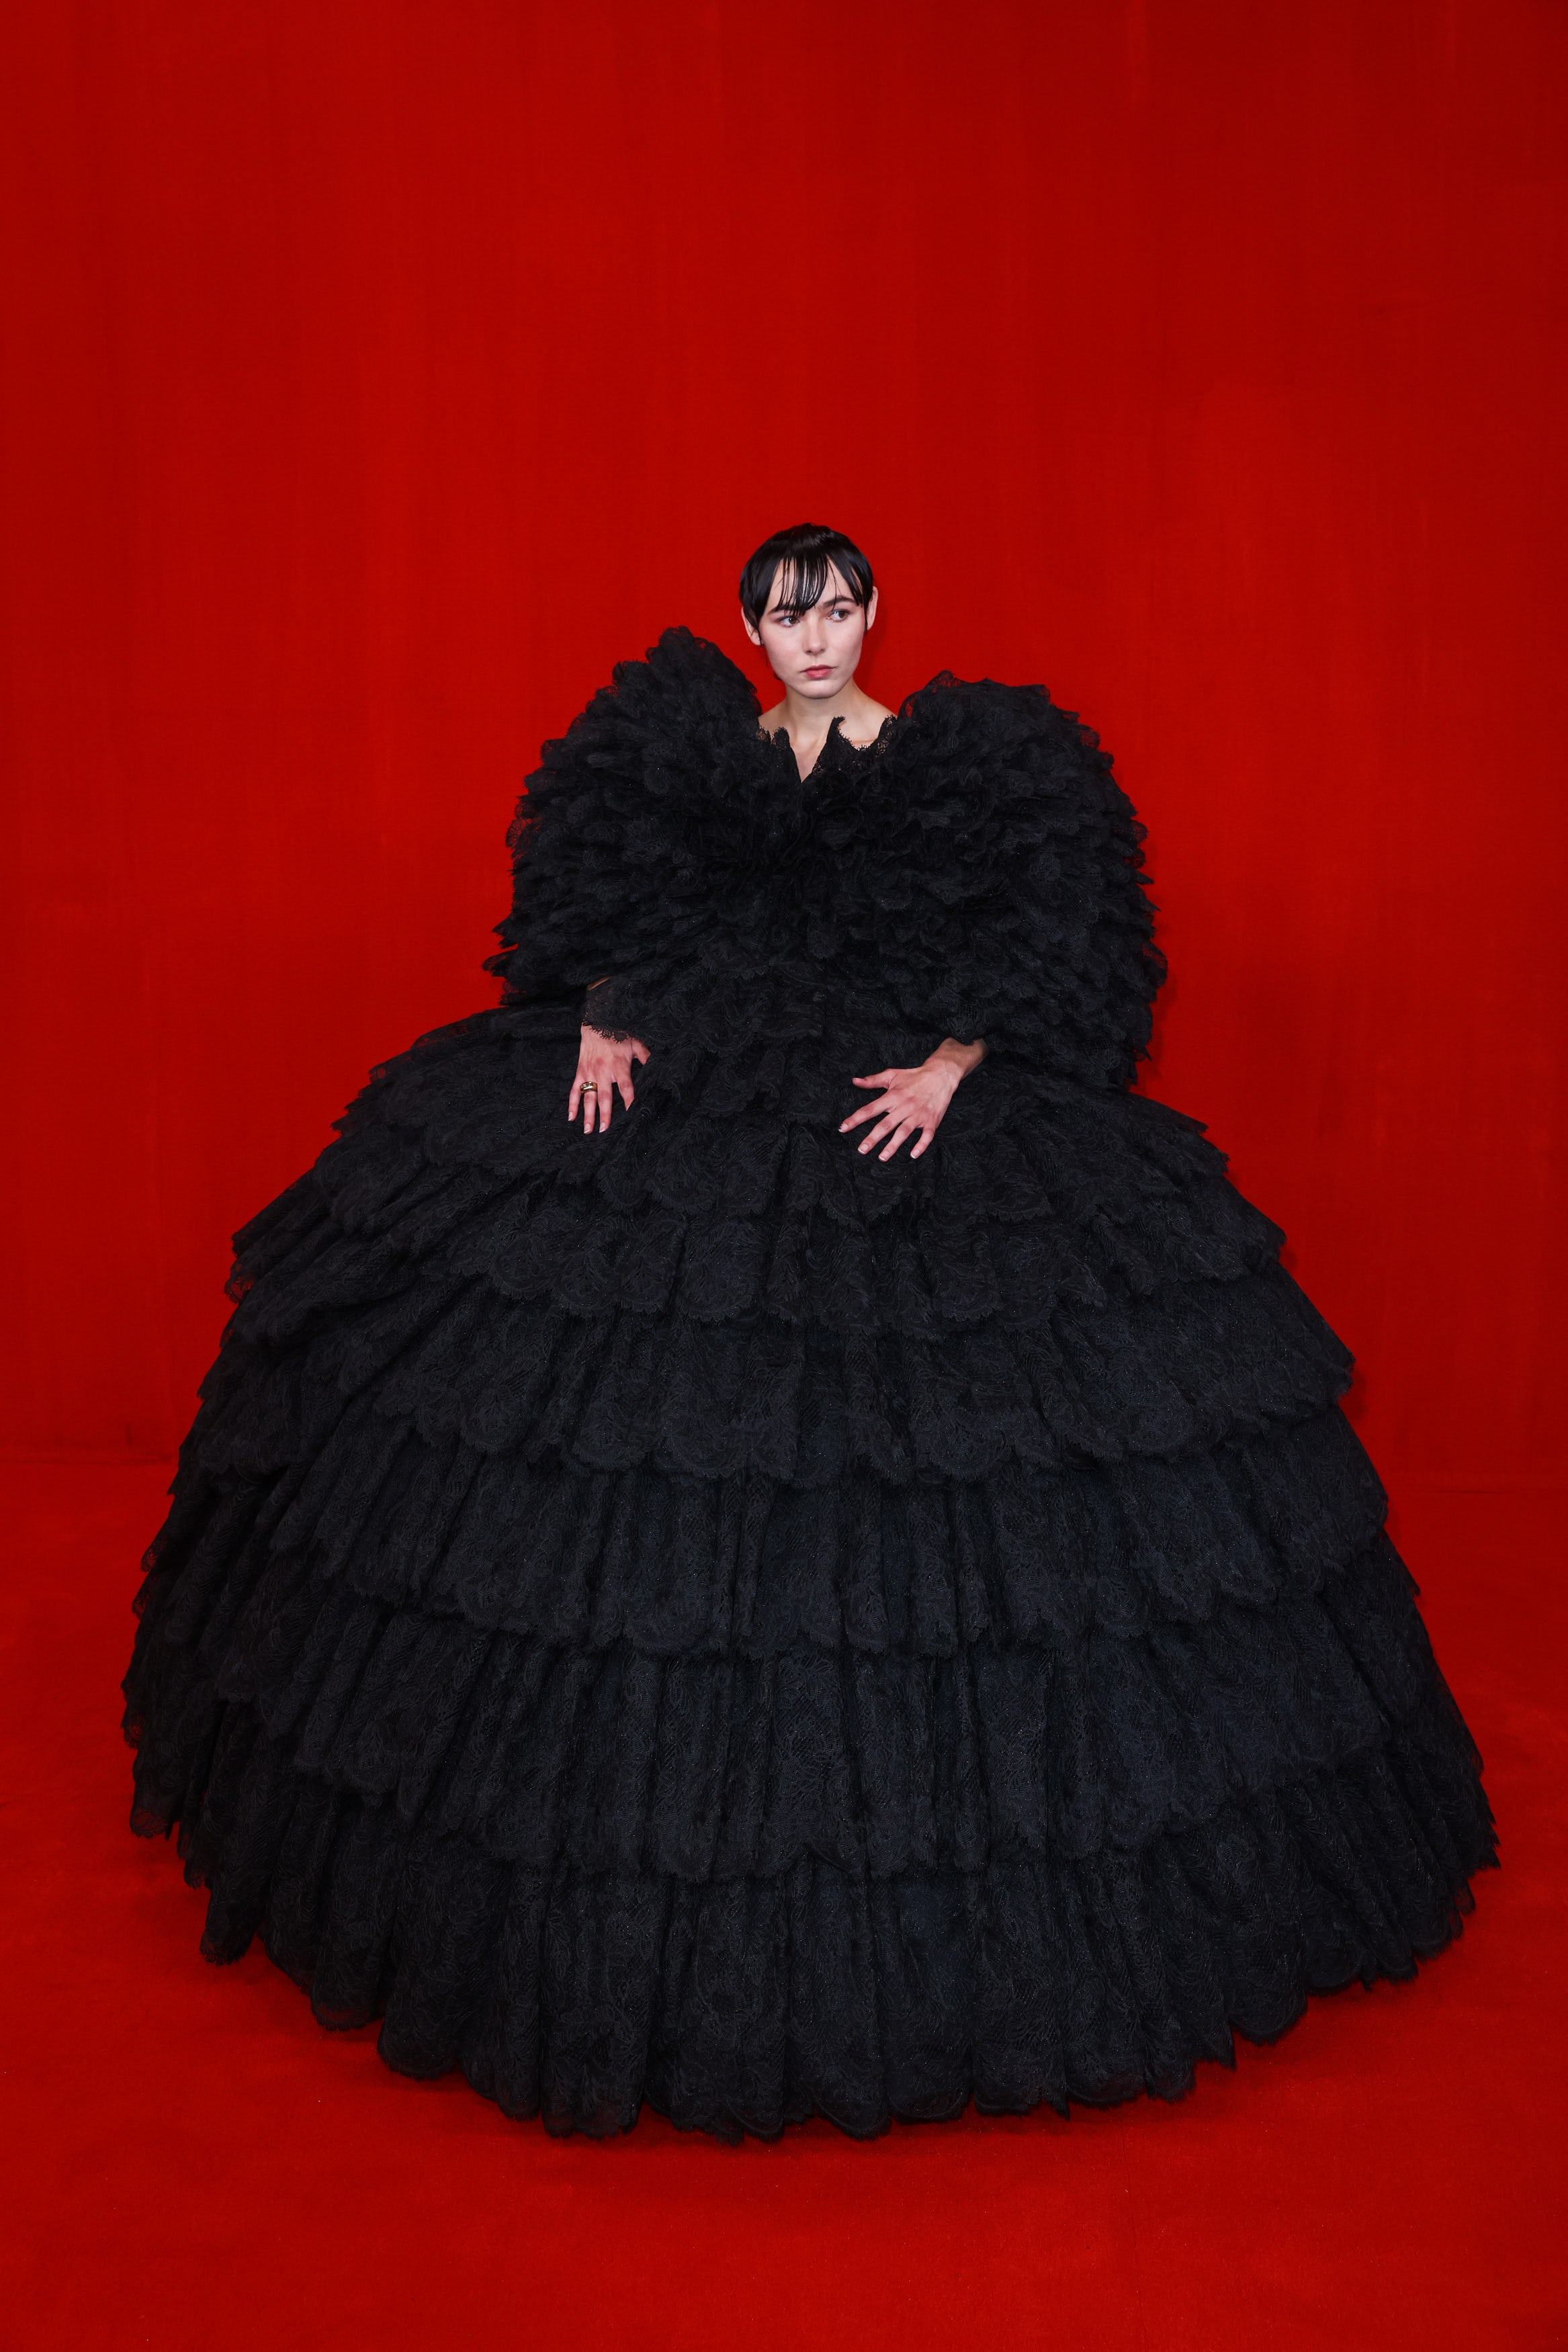 A model in Balenciaga Spring/Summer 2022. Richard Bord/Getty Images.